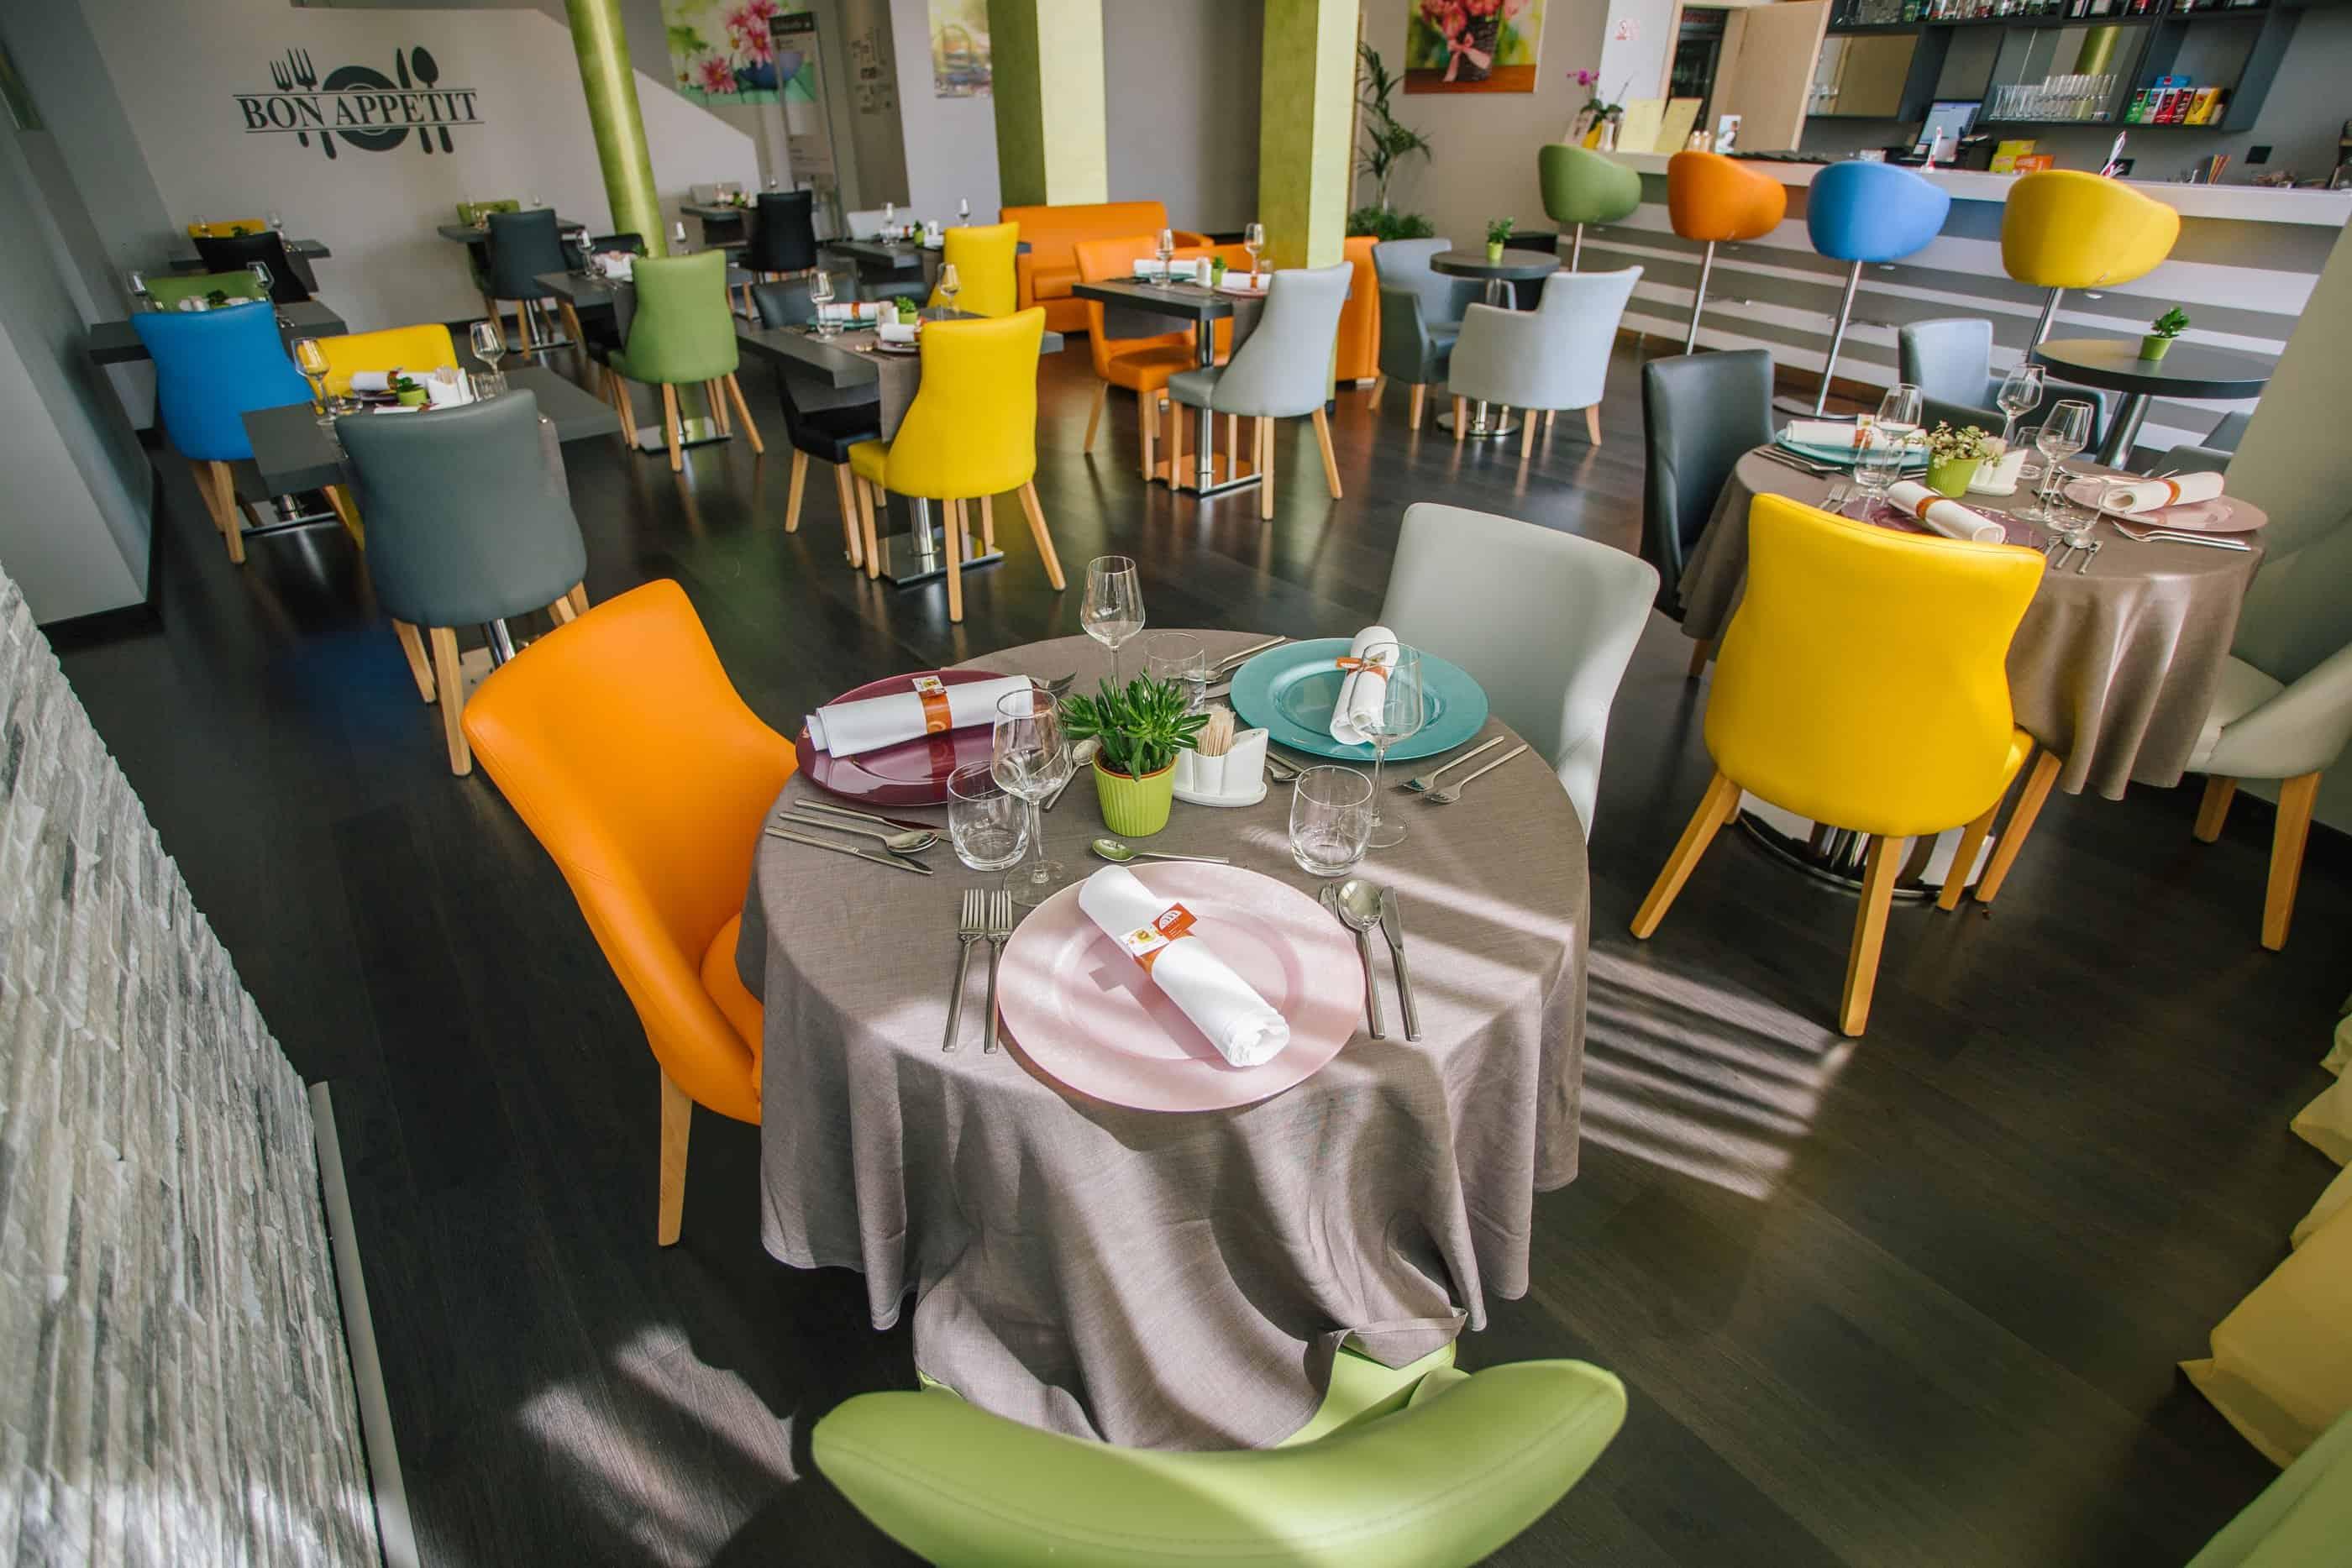 Hotel Restoran Villa Magdalena, Krapinske Toplice